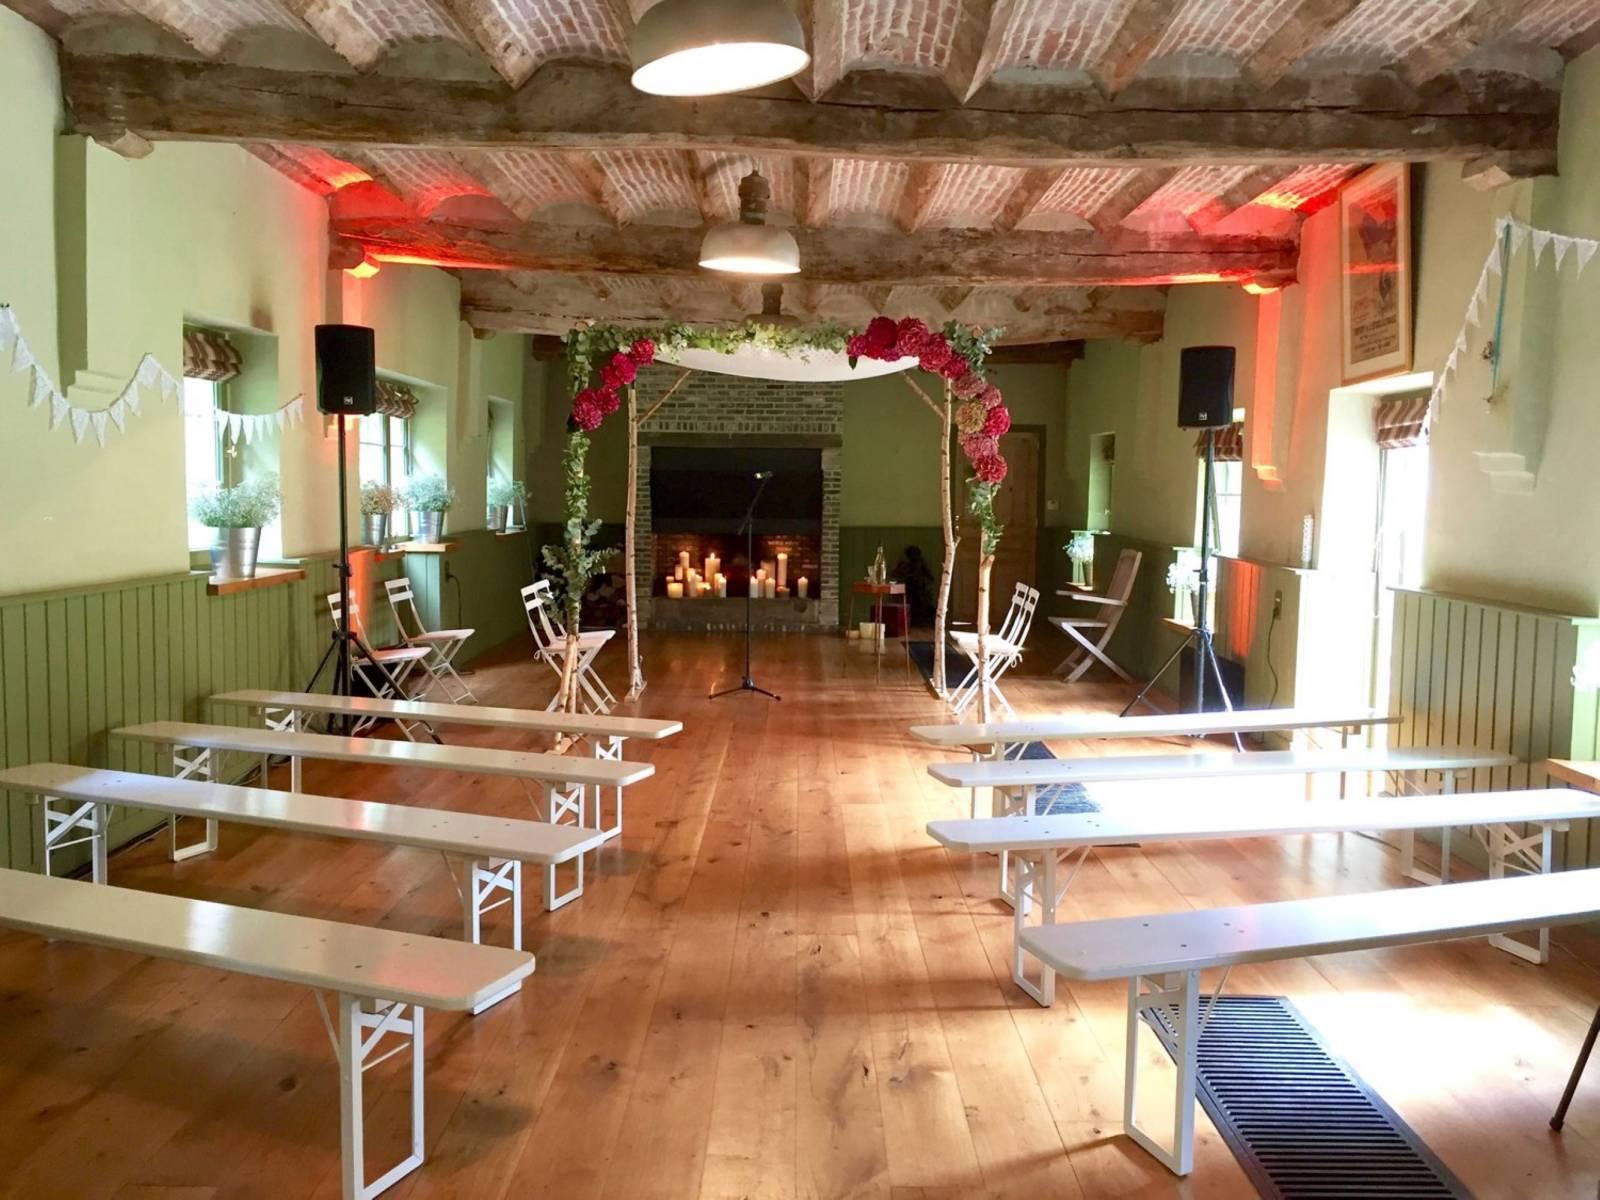 La ferme de Balingue House of Weddings feestzaal salle de fete lieu exceptionnel huwelijk mariage trouwen trouwzaal Brusse (21)